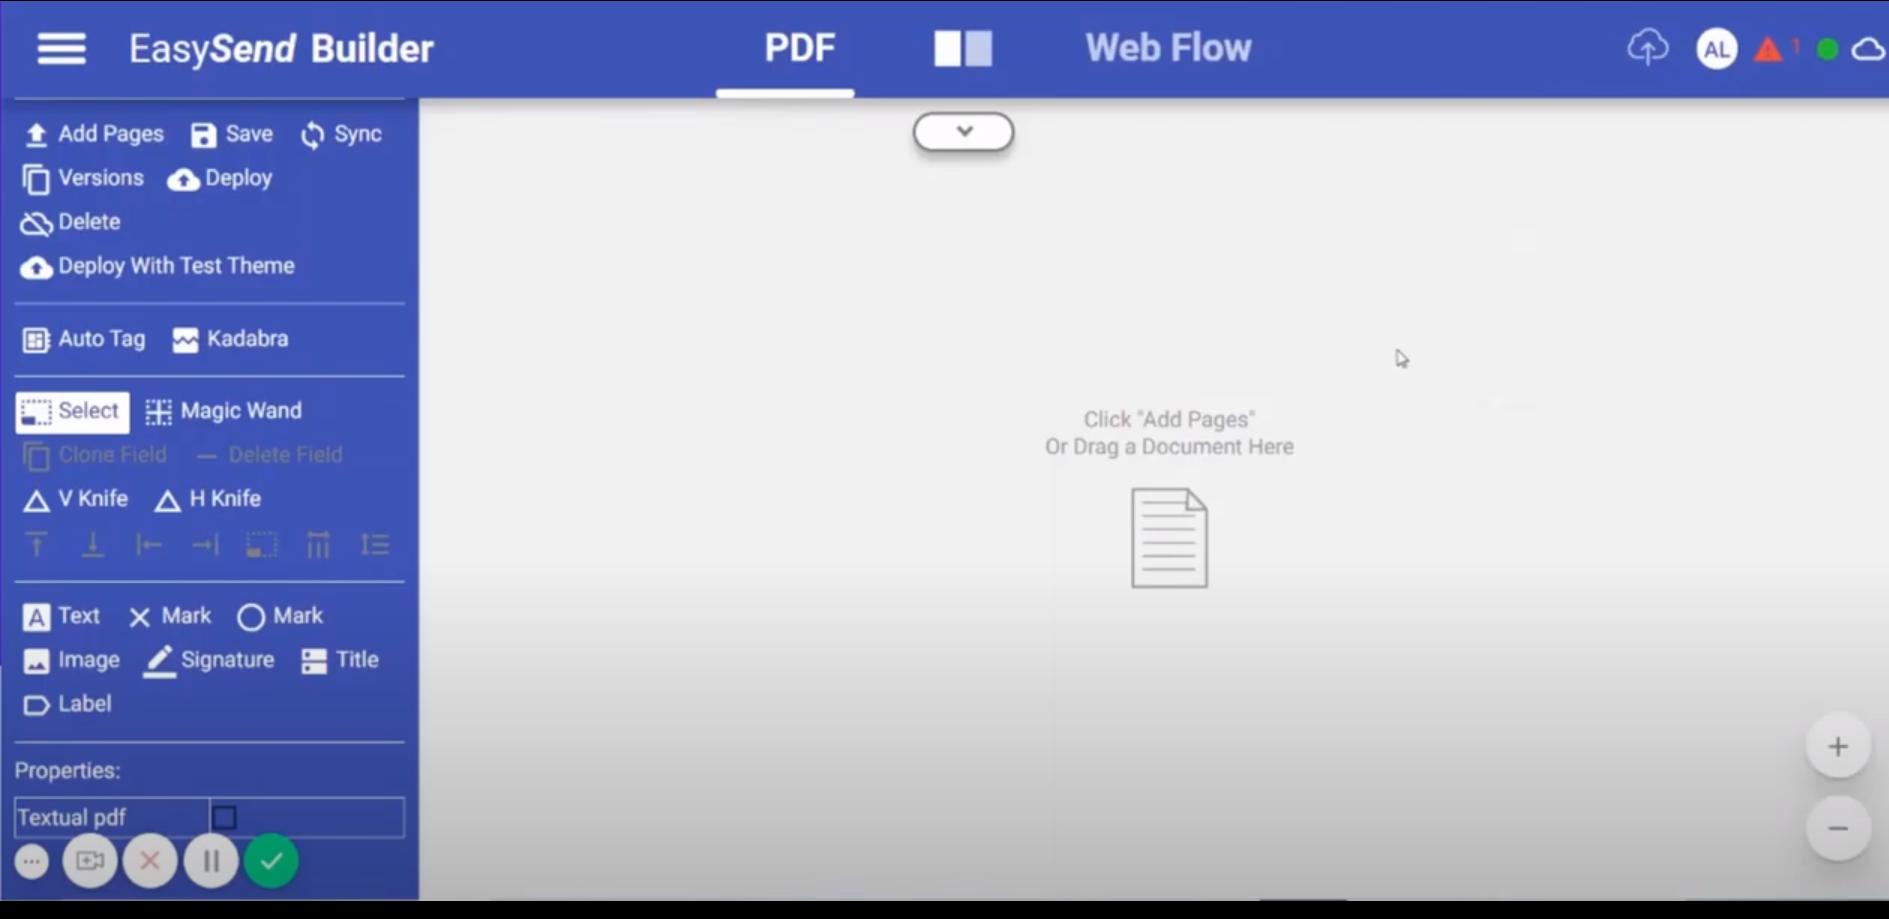 EasySend webflow